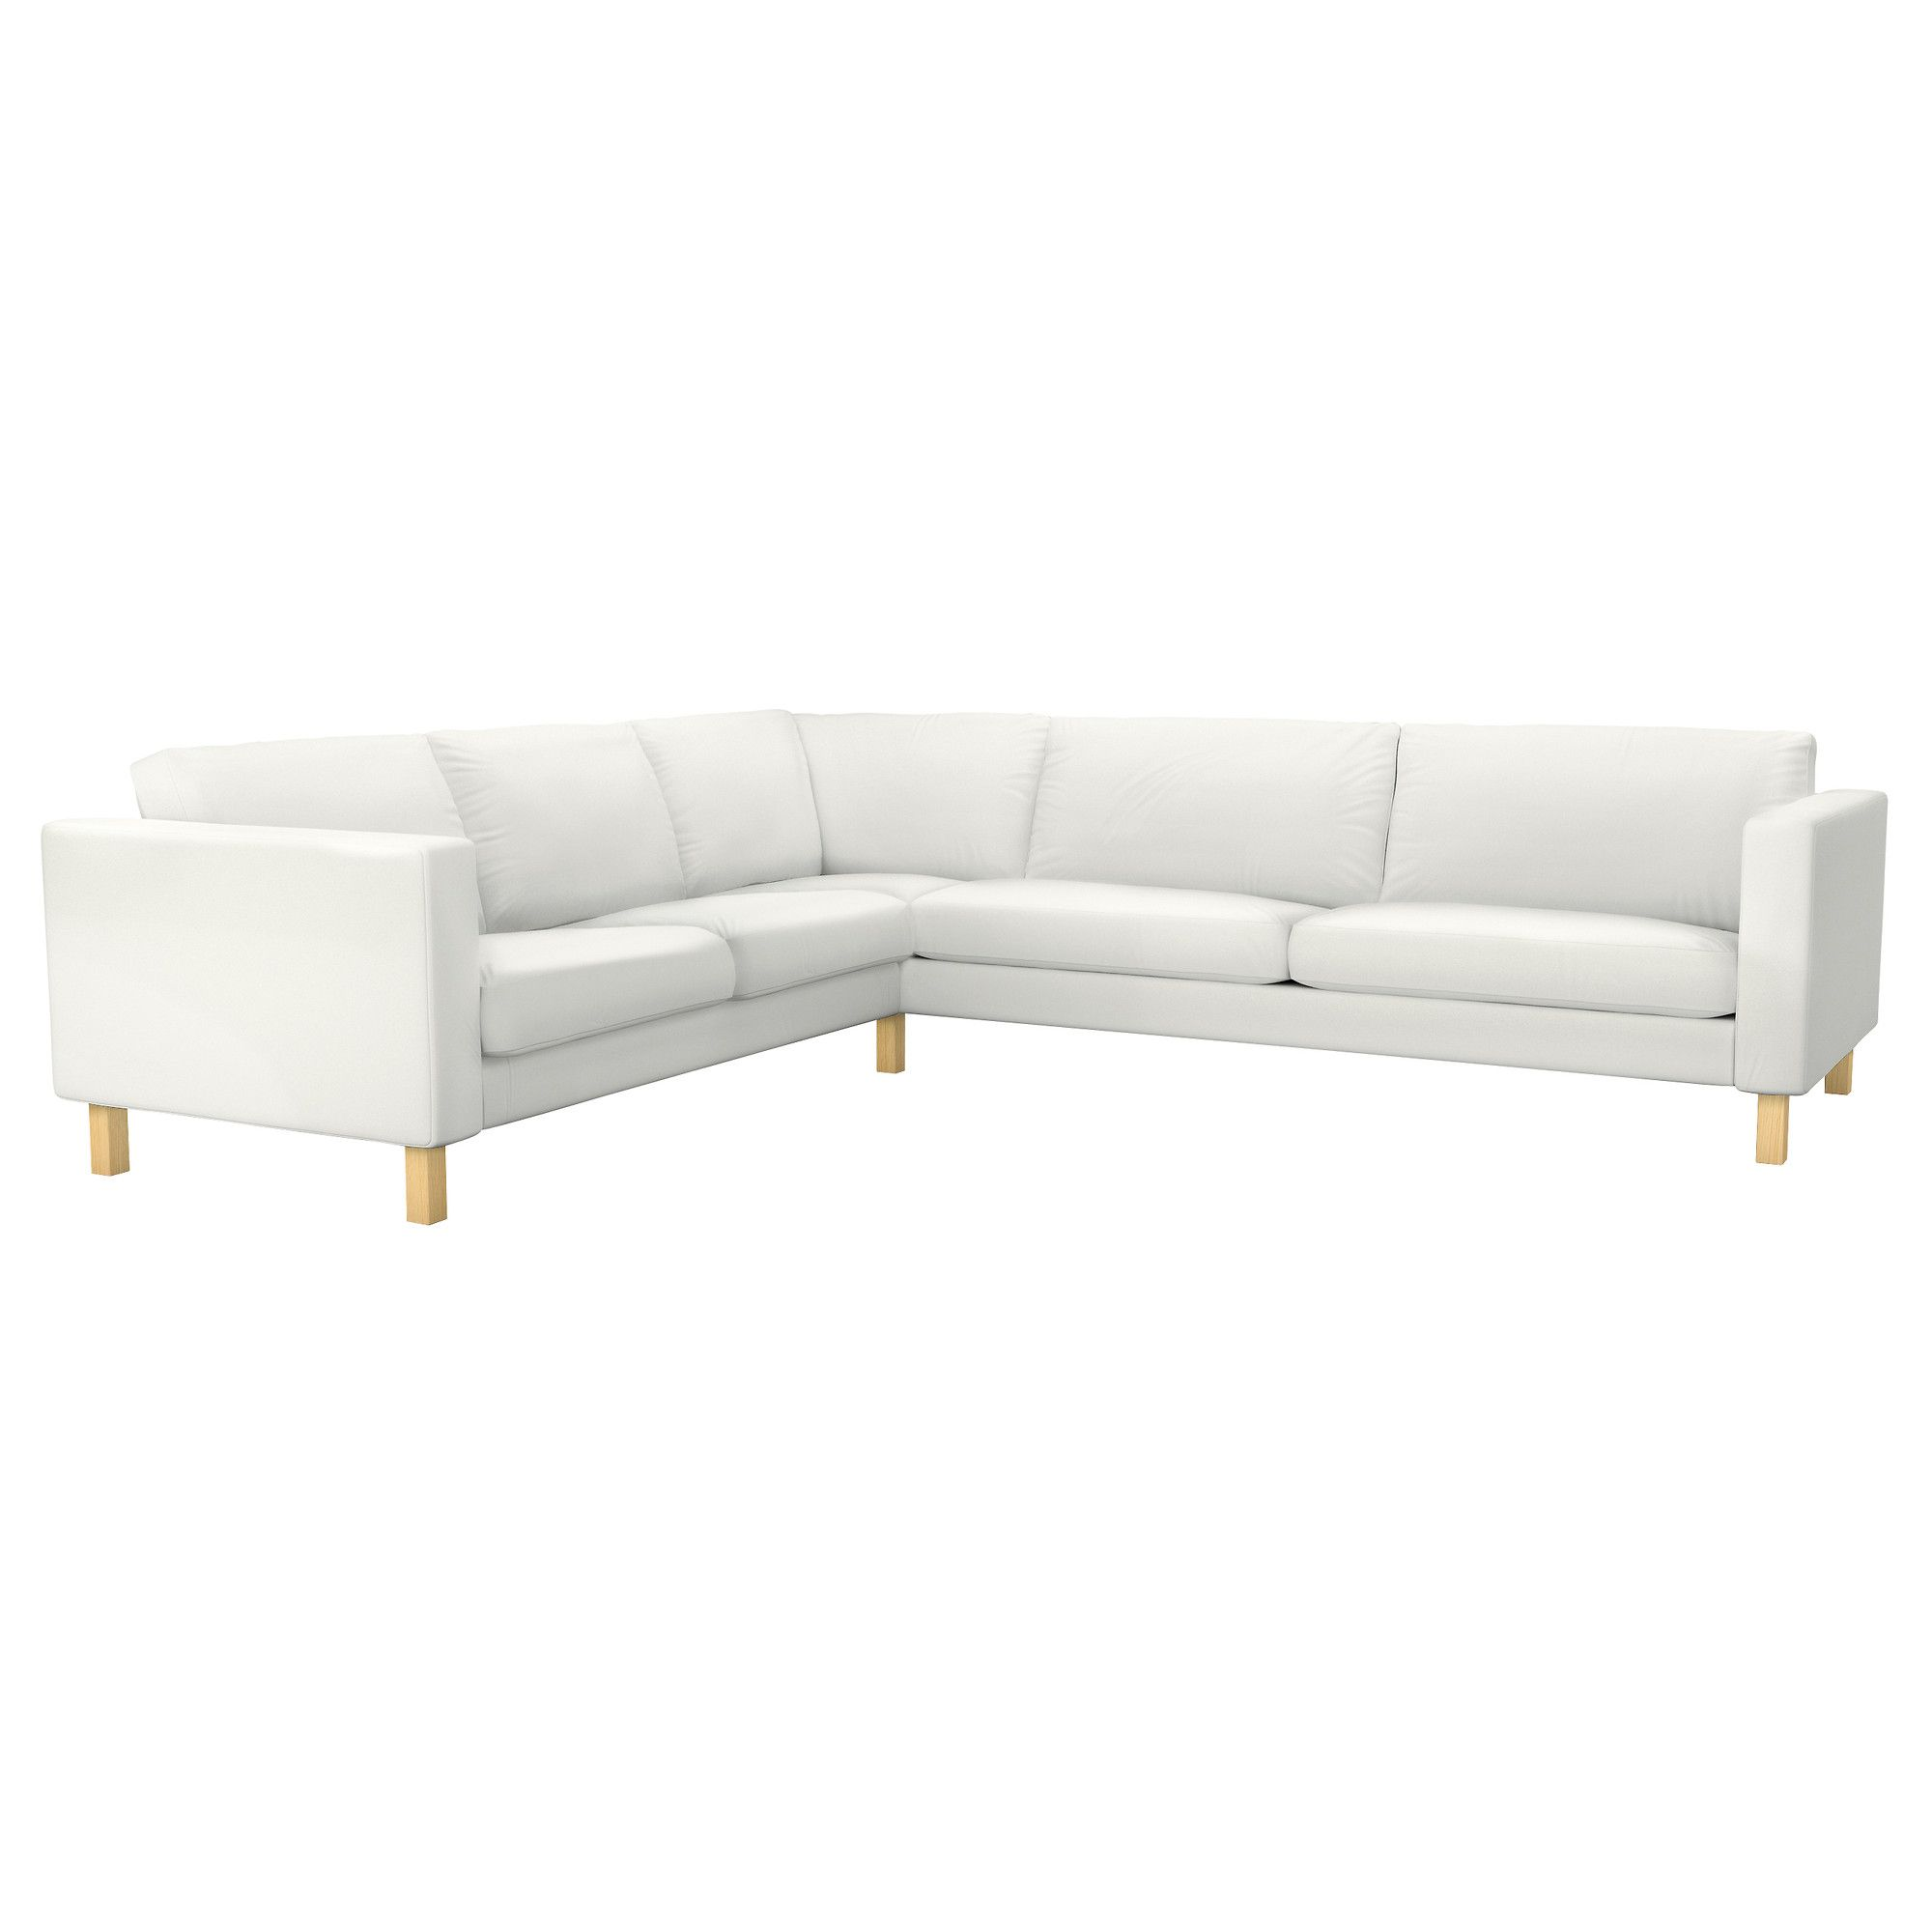 Karlstad Sofa Blekinge White Scandinavian Sofas Australia Our Next Major Piece Of Furniture Corner 2